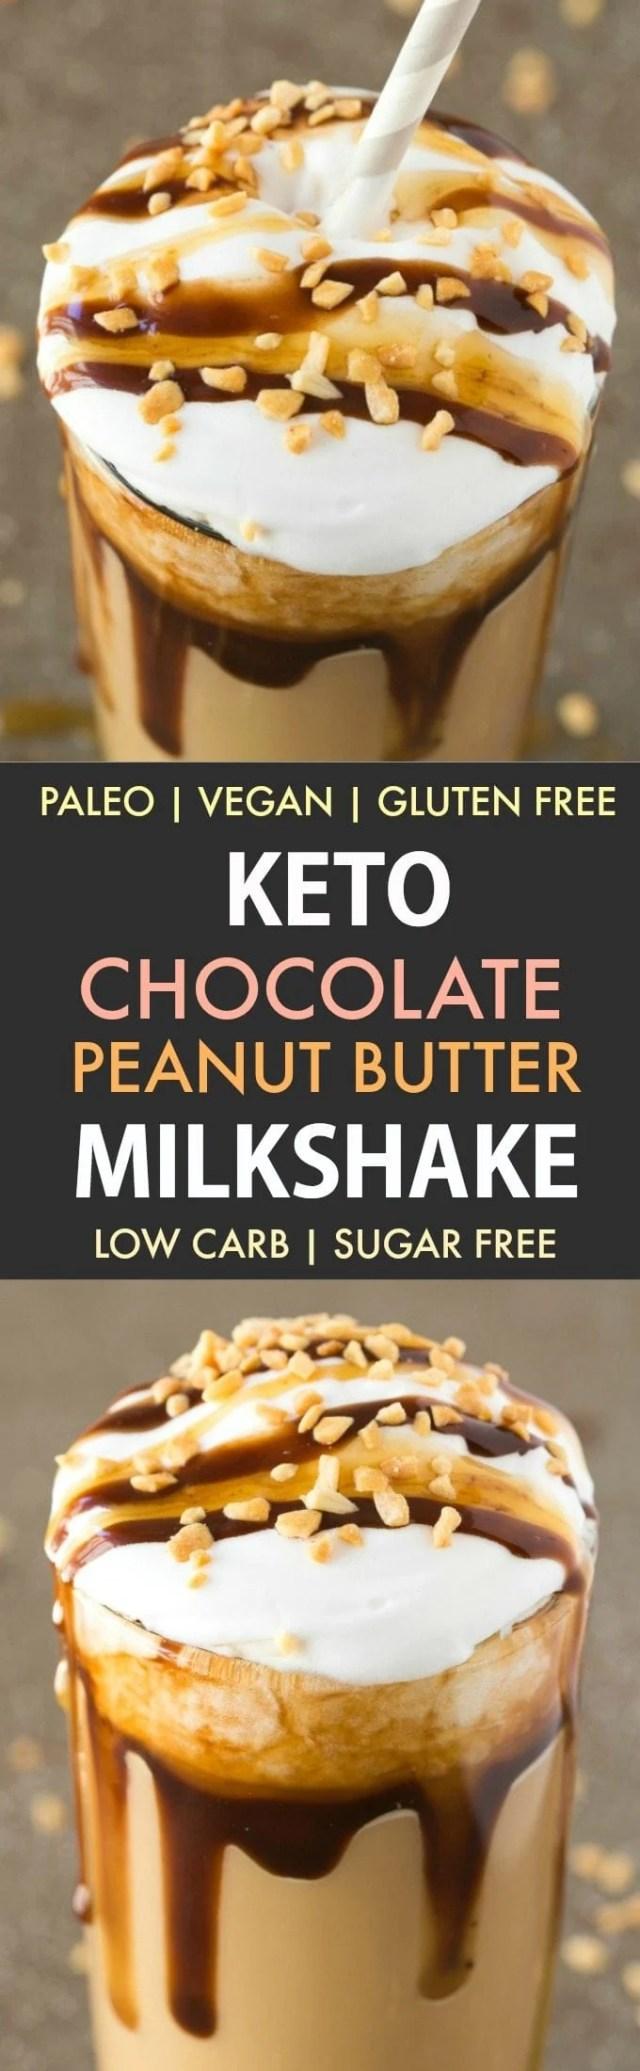 Keto Chocolate Peanut Butter Milkshake (Dairy Free, Paleo, Vegan, Gluten Free)- Insanely thick and creamy chocolate peanut butter milkshake which tastes like snickers! It's low carb and sugar free too! {v, gf, p recipe}- #keto #ketobreakfast #lowcarb #smoothie #dairyfreemilkshake | Recipe on thebigmansworld.com